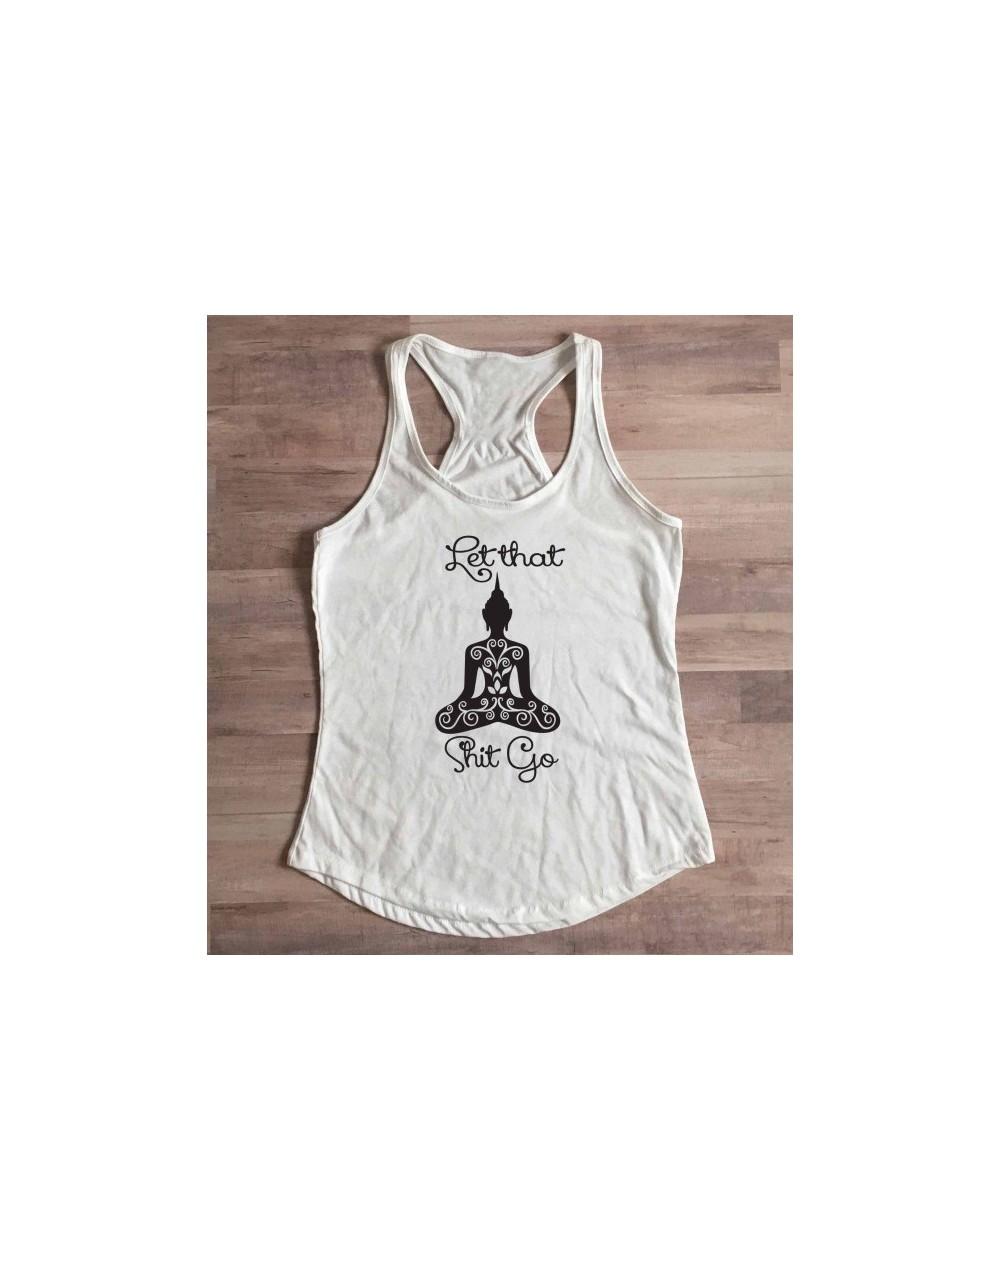 Let That Shit Go Racerback Tank Top religion funny gift grunge tumblr vest undershirt singlet sleeveless party street garmen...